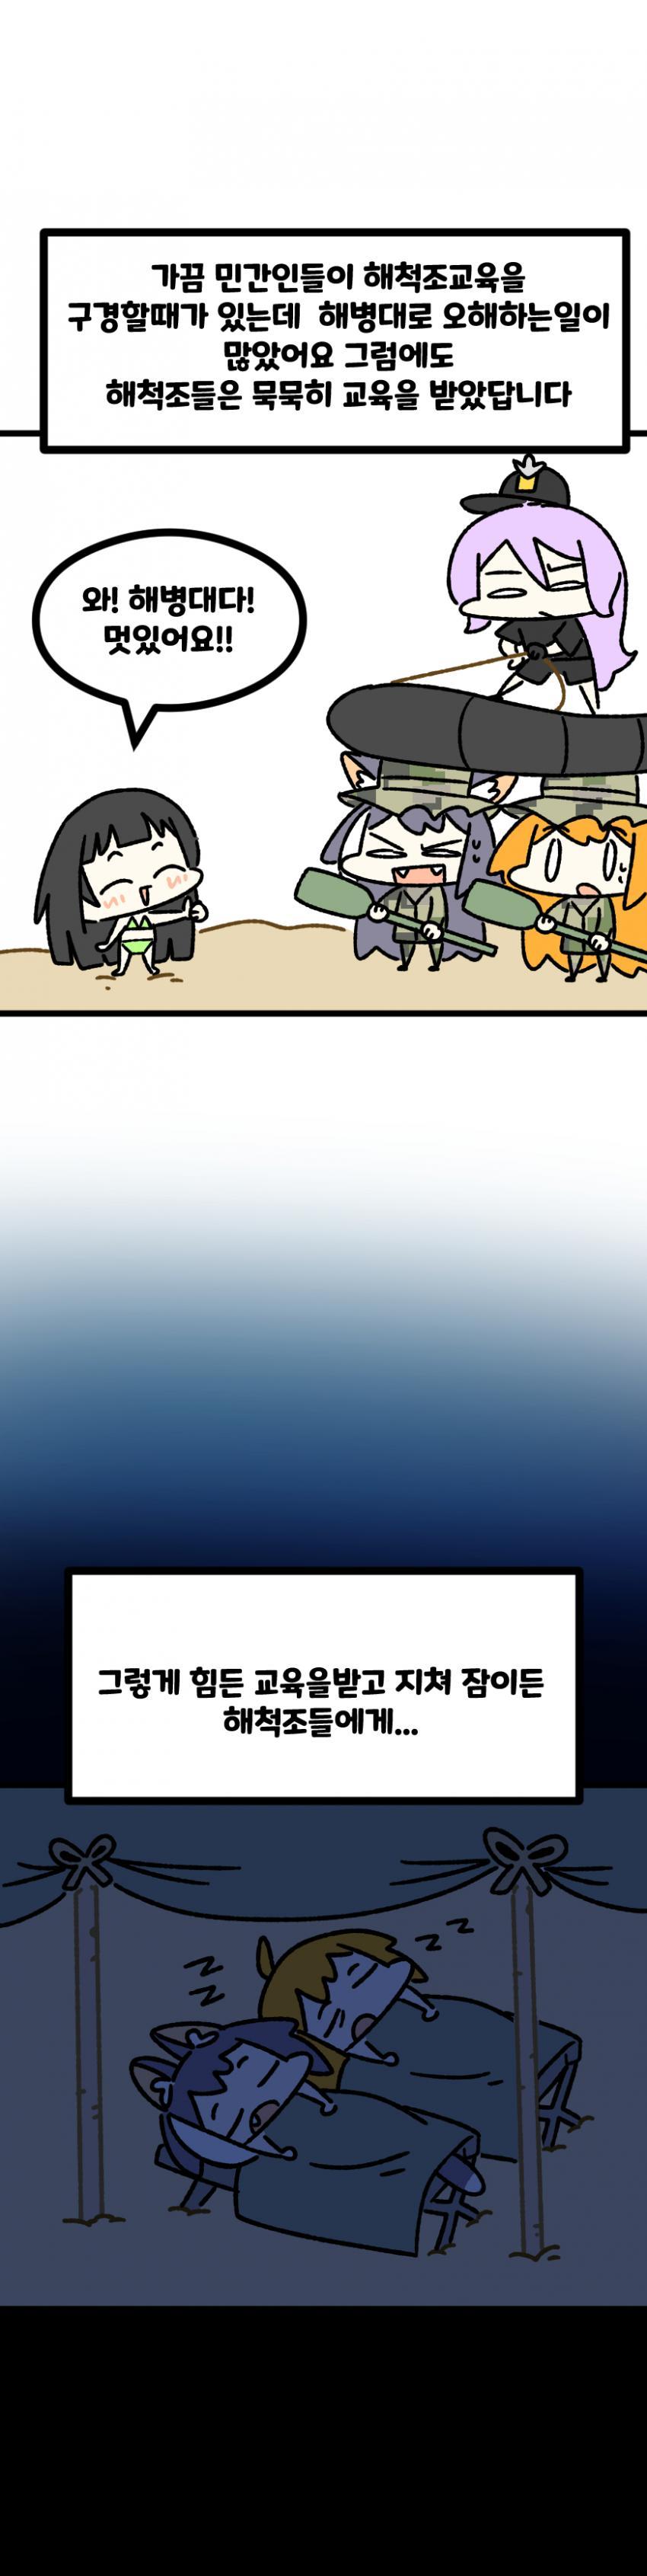 viewimage.php?id=2ebcc232eadd36&no=24b0d769e1d32ca73fec8ffa11d0283194eeae3ea3f7d0da351cf9d343807012292cb4dd413190a65cf8a07dc783c8aea776fb3abe28c7118ecbb91236445e827d